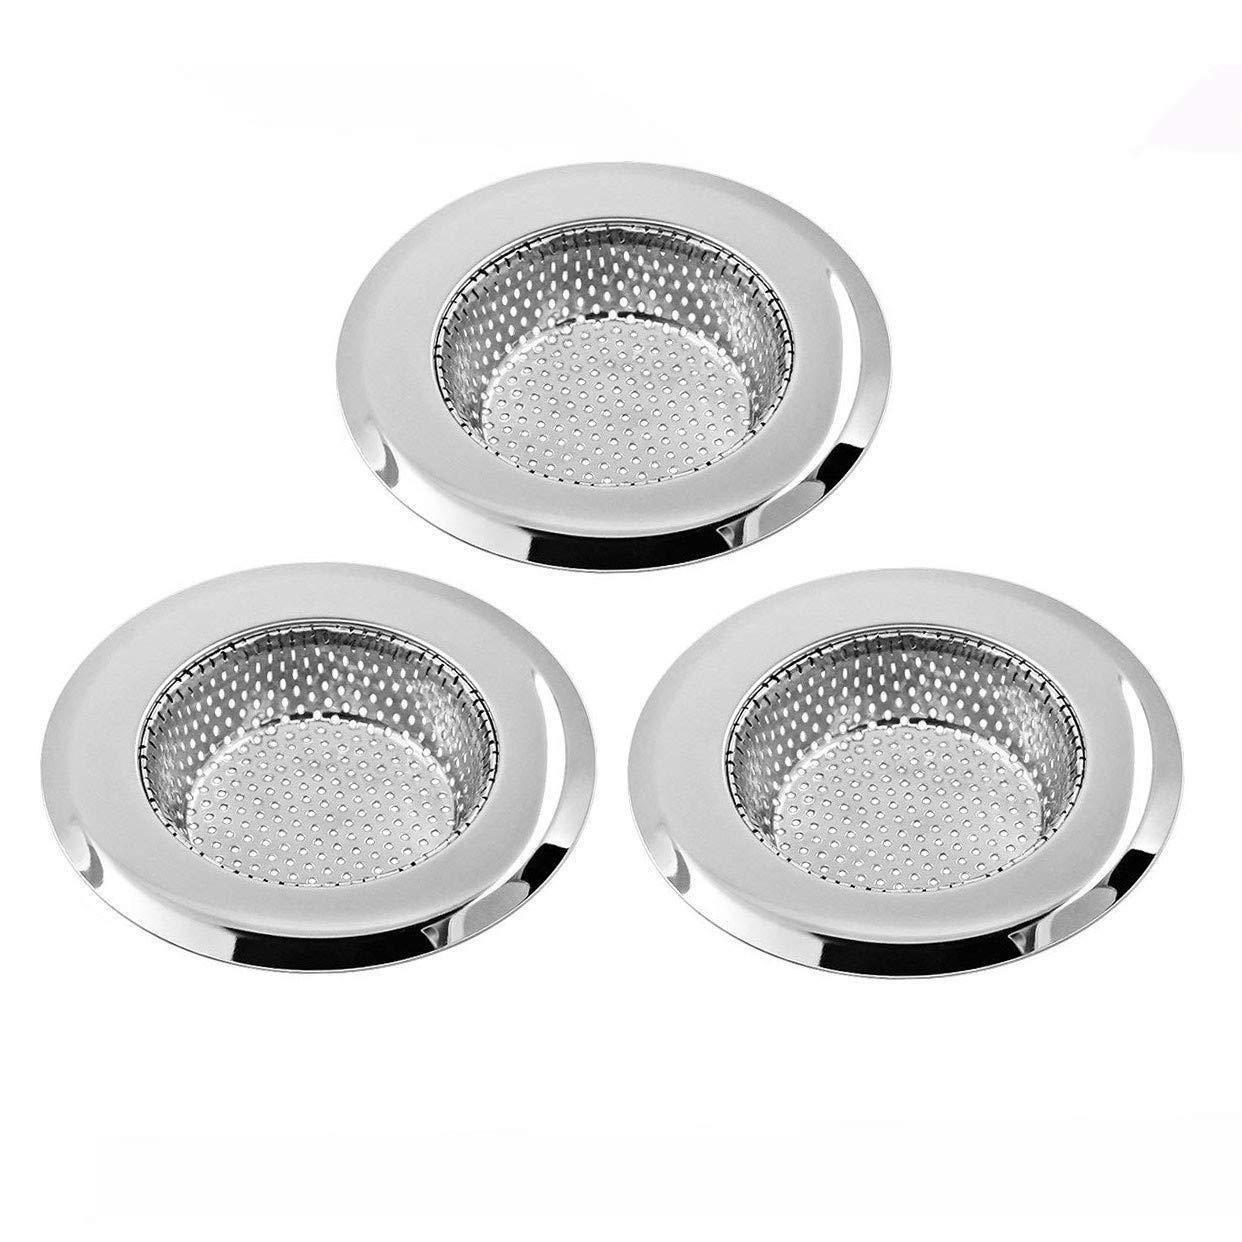 Xrten 3 Piezas Filtro de Fregadero de Cocina de Acero Inoxidable para Fregadero Lavabo baño o Cocina